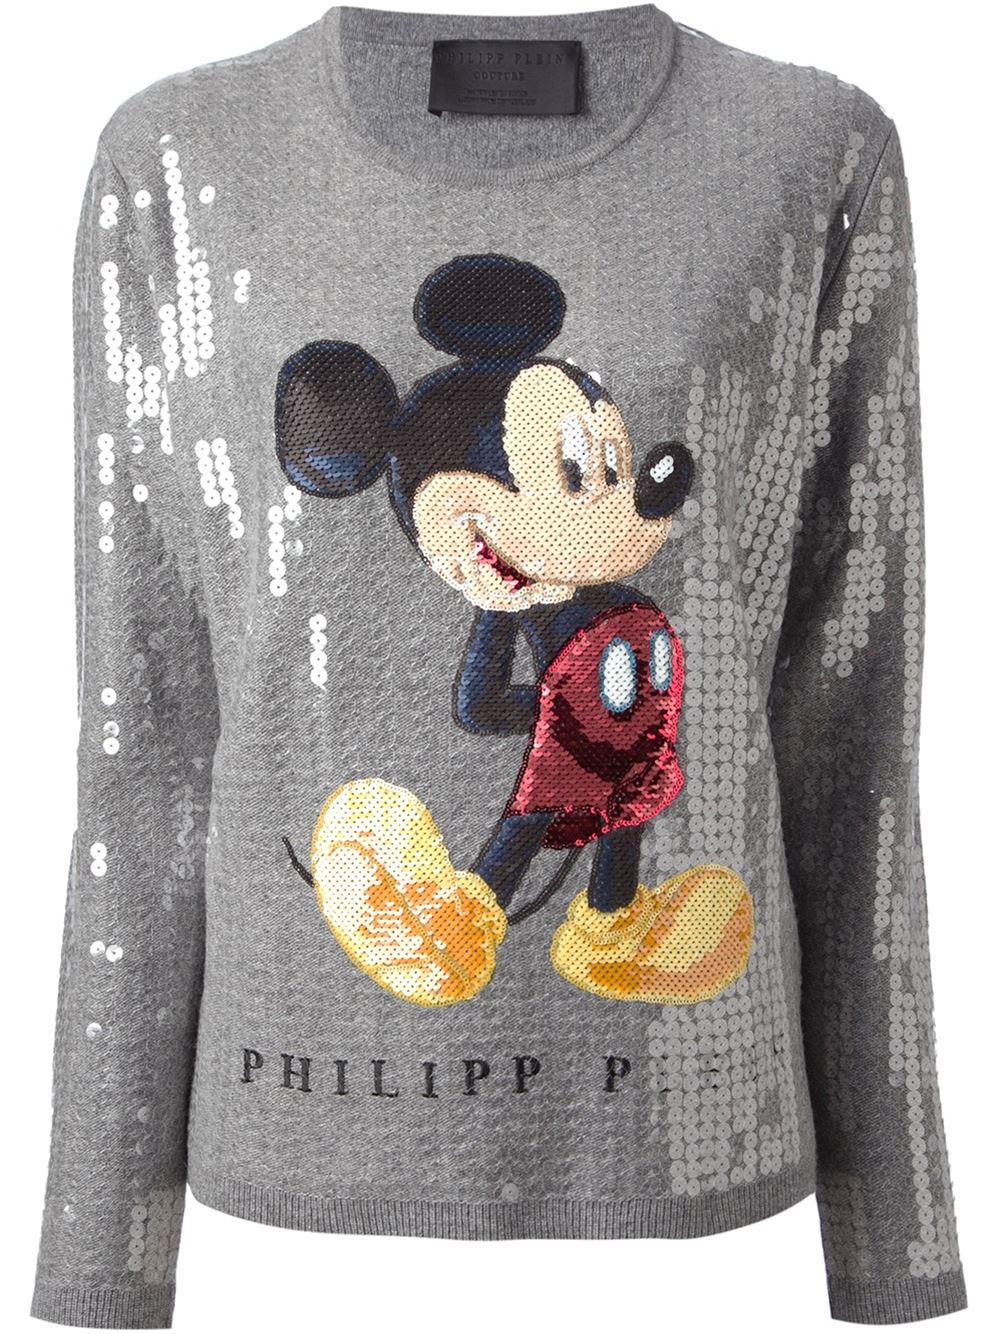 Philipp plein sequin embellished sweater